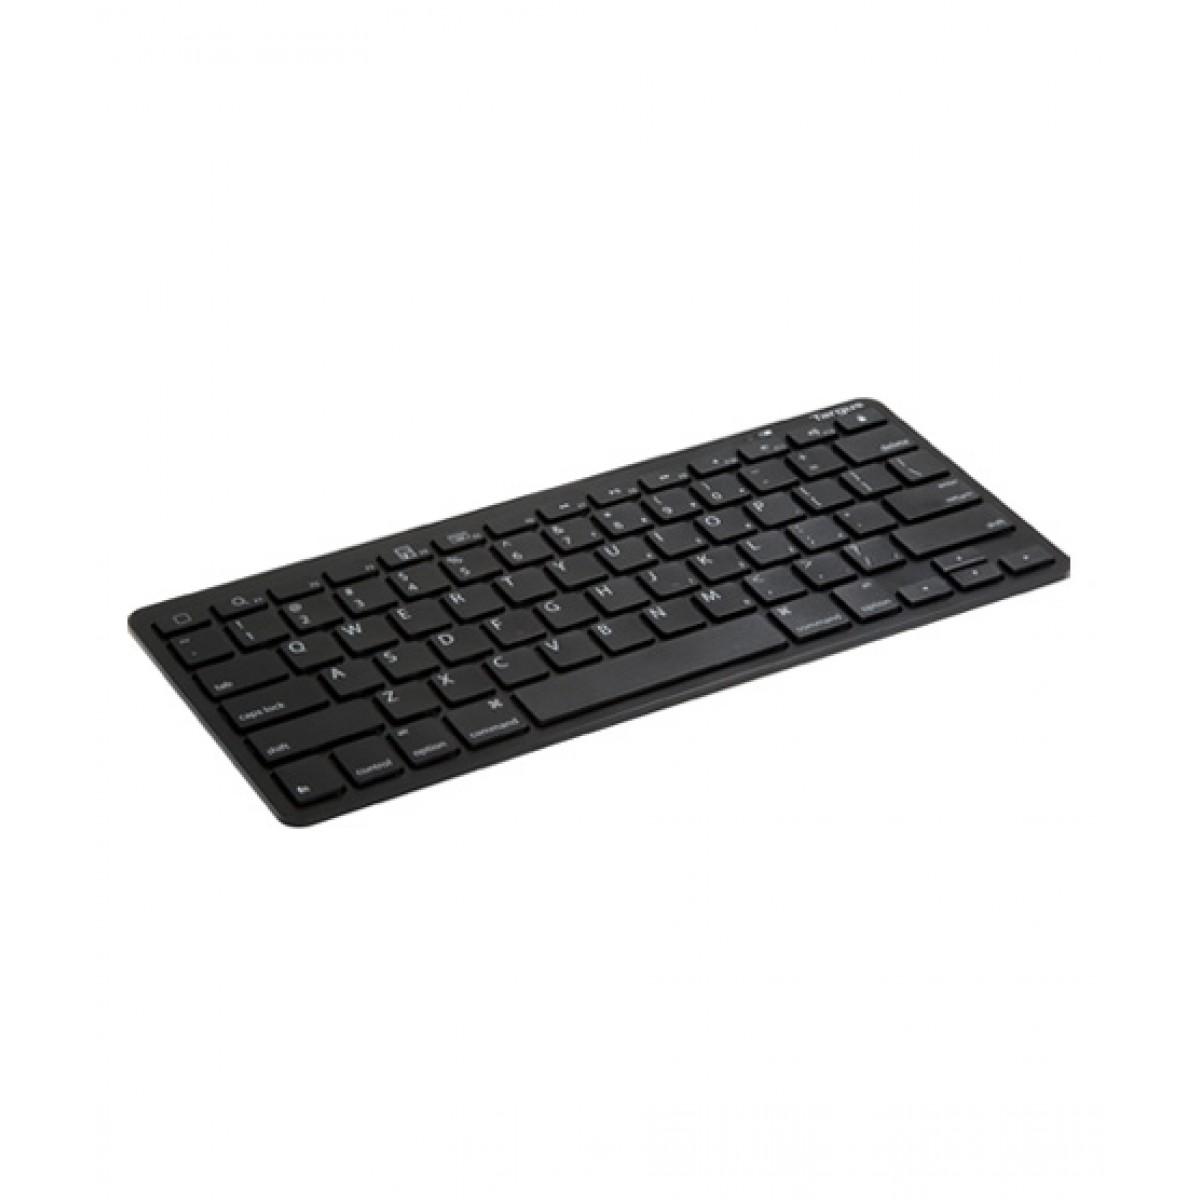 Targus Bluetooth Keyboard For Tablets Black (AKB33US)